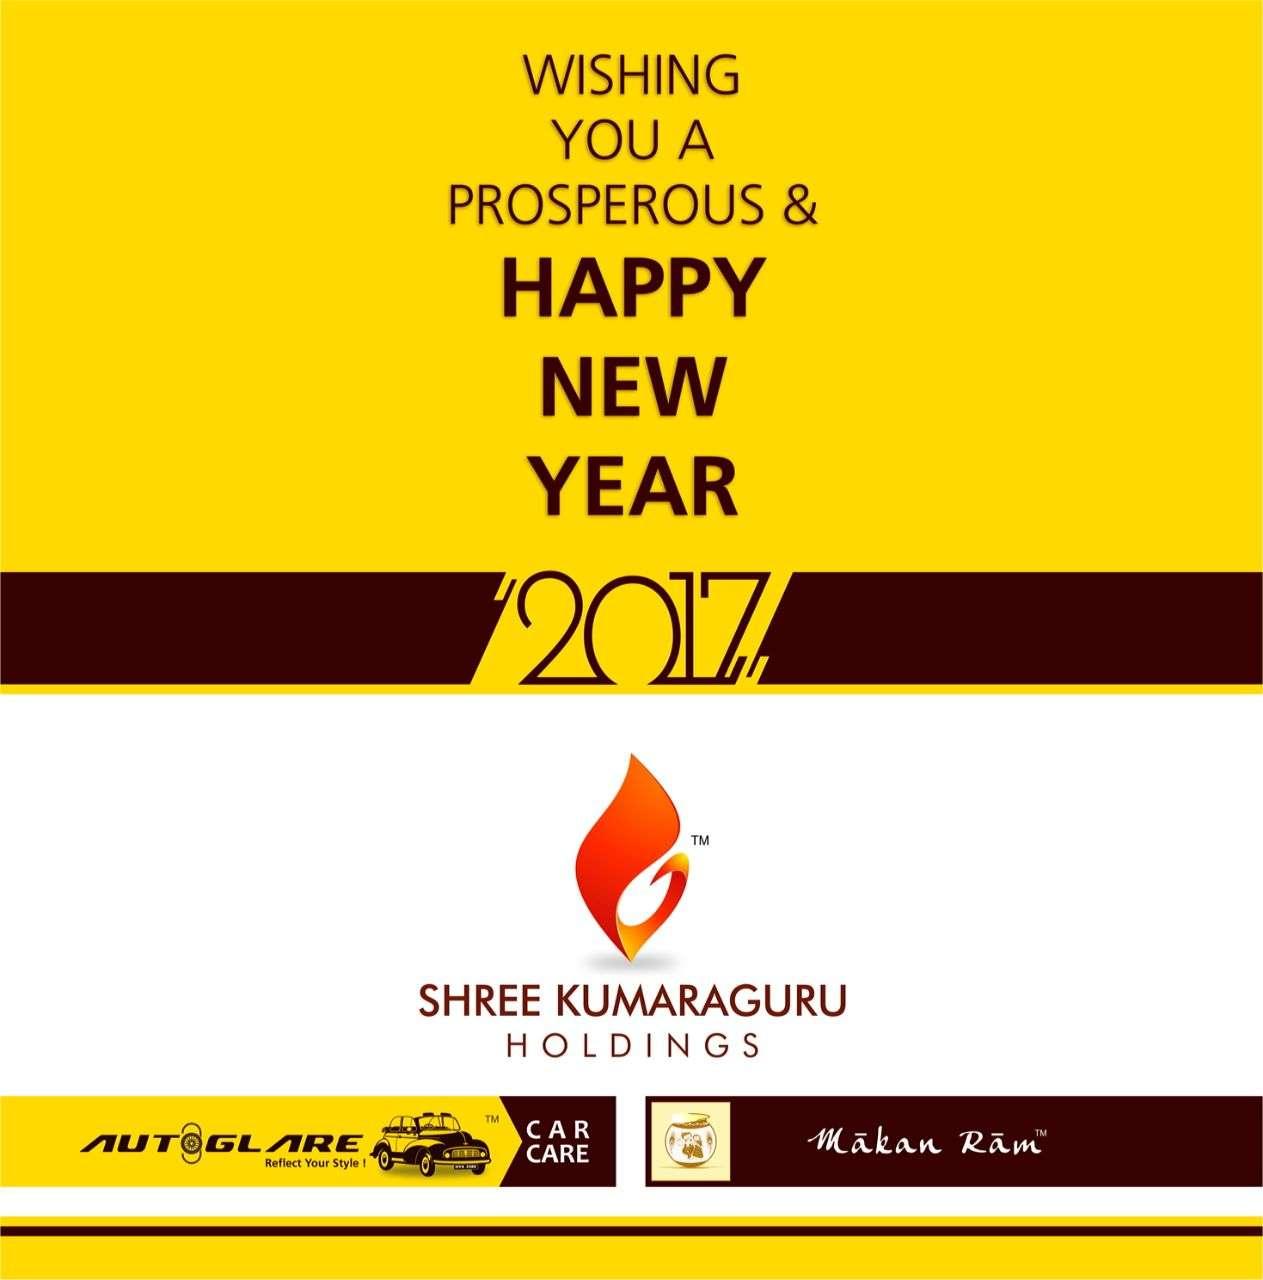 Shree Kumaraguru Holdings Hyderabad